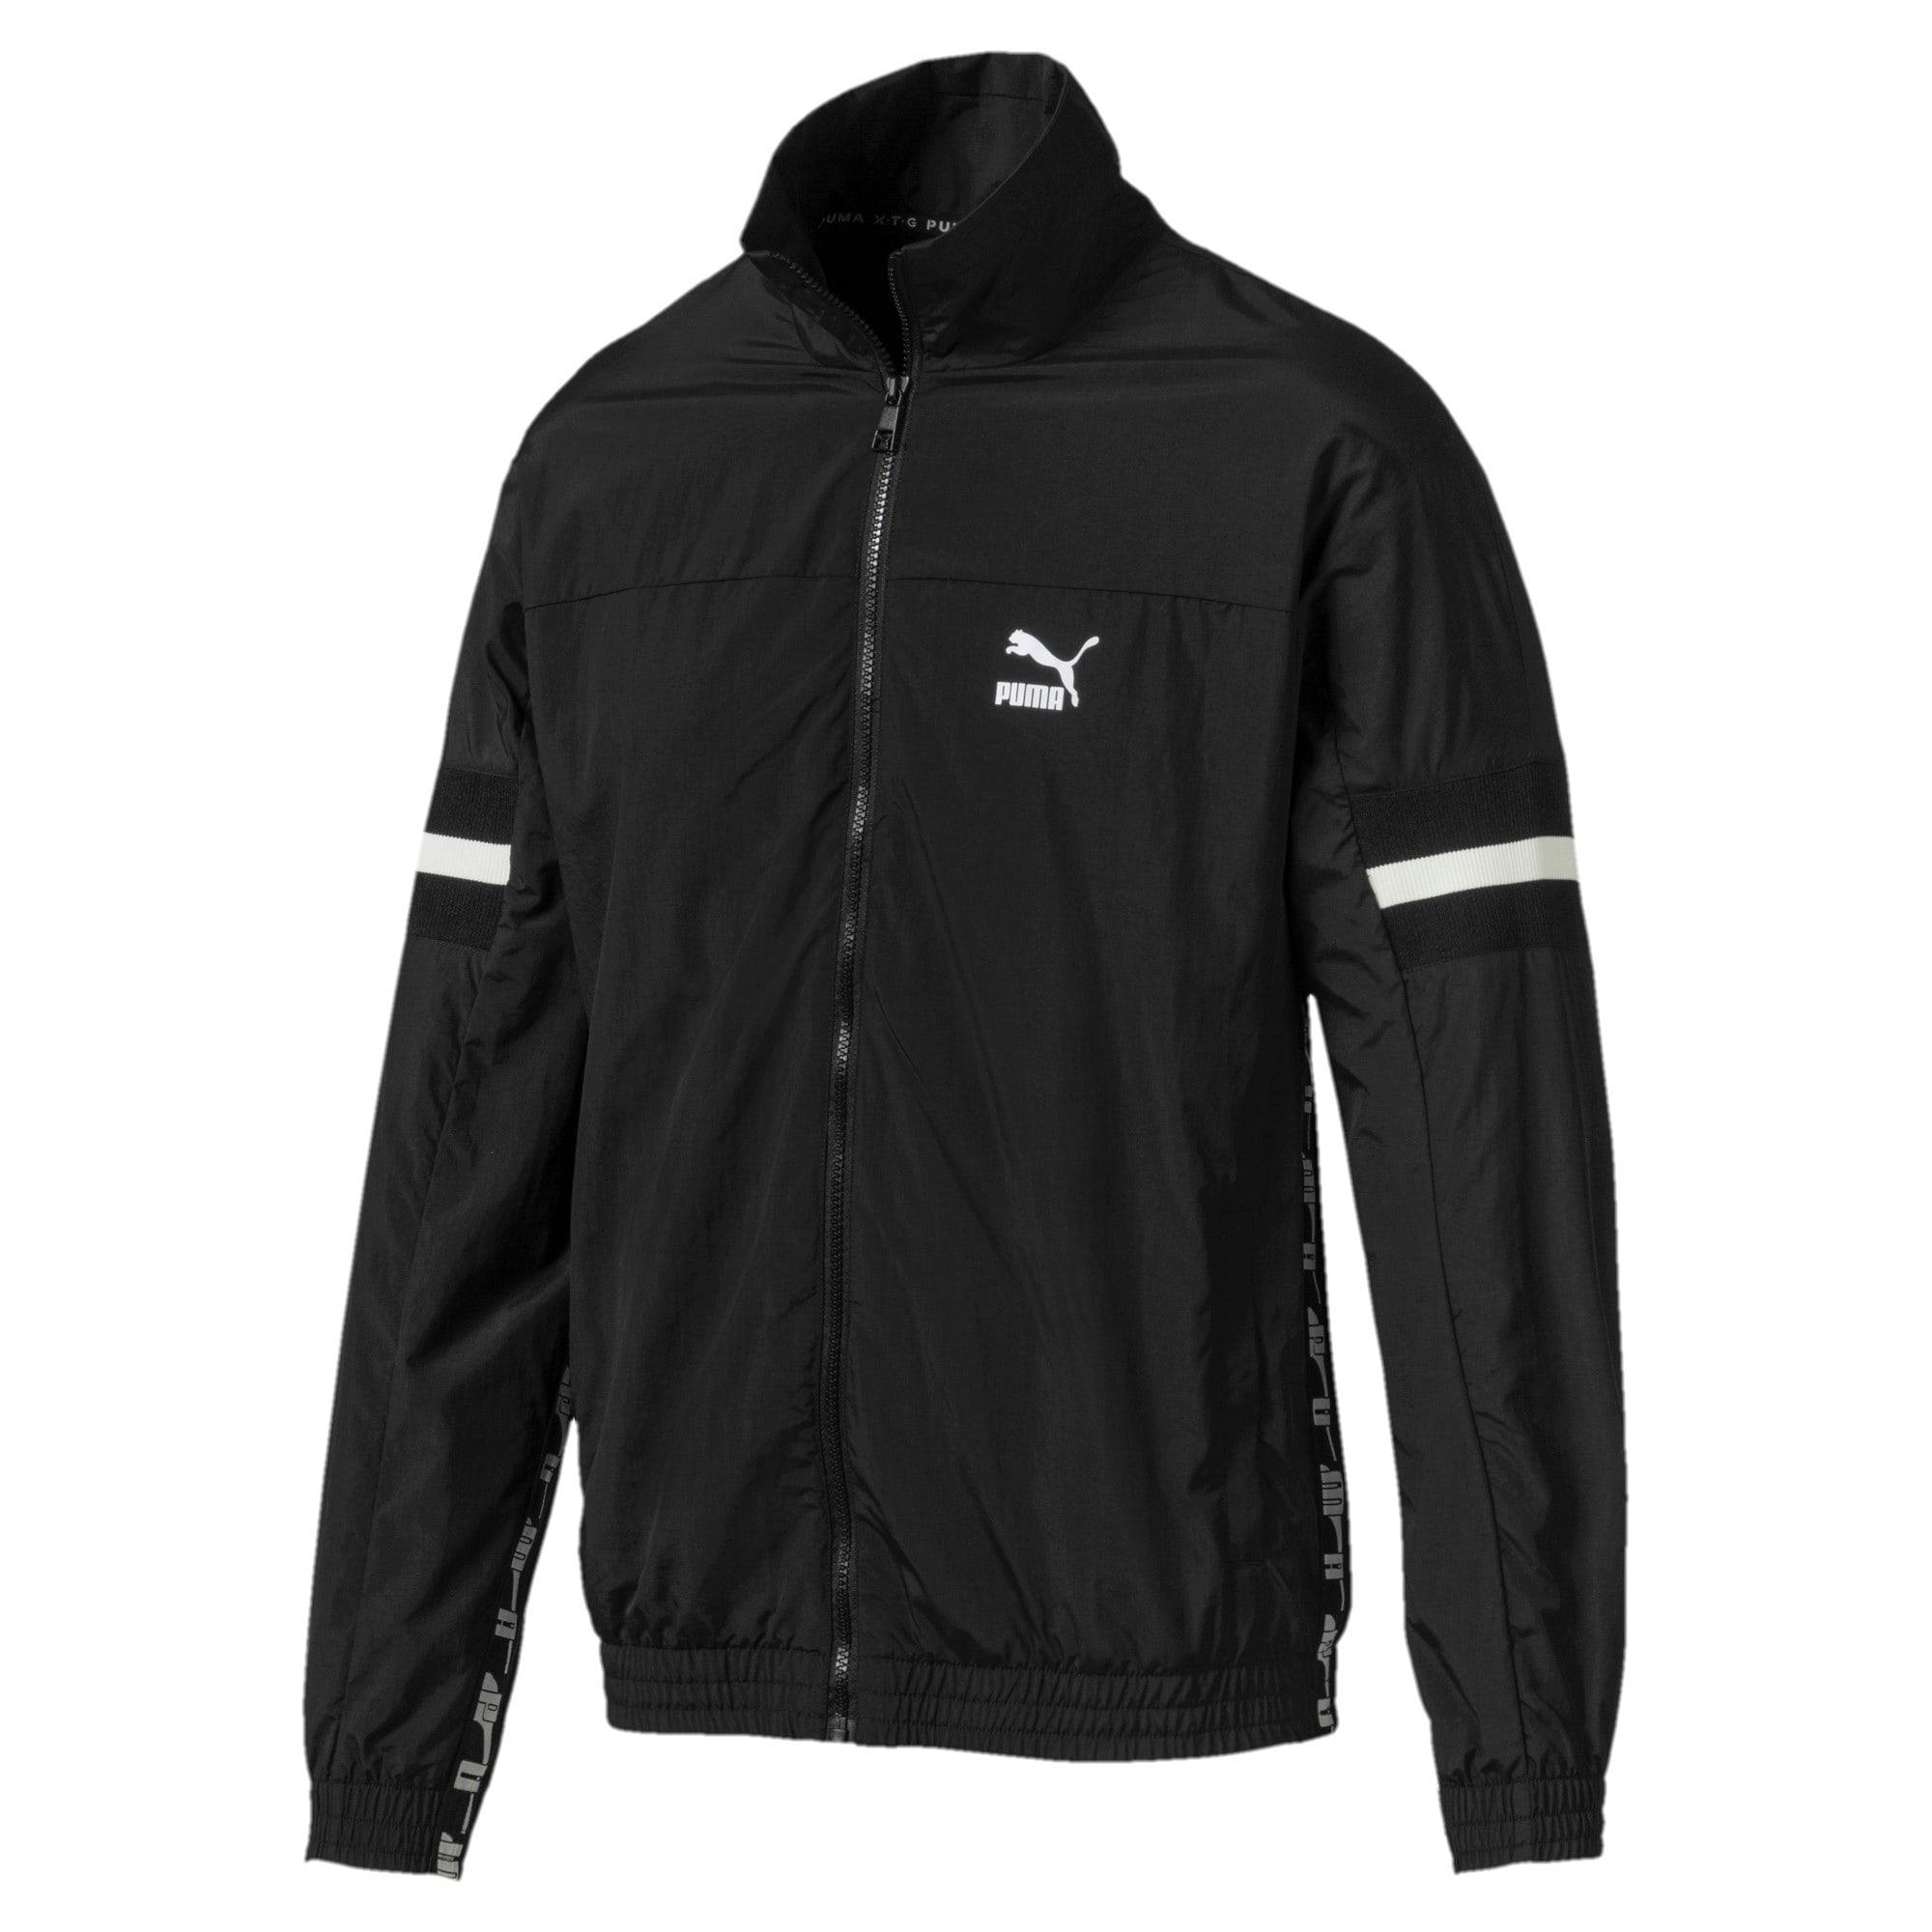 Thumbnail 4 of PUMA XTG Men's Woven Jacket, Puma Black, medium